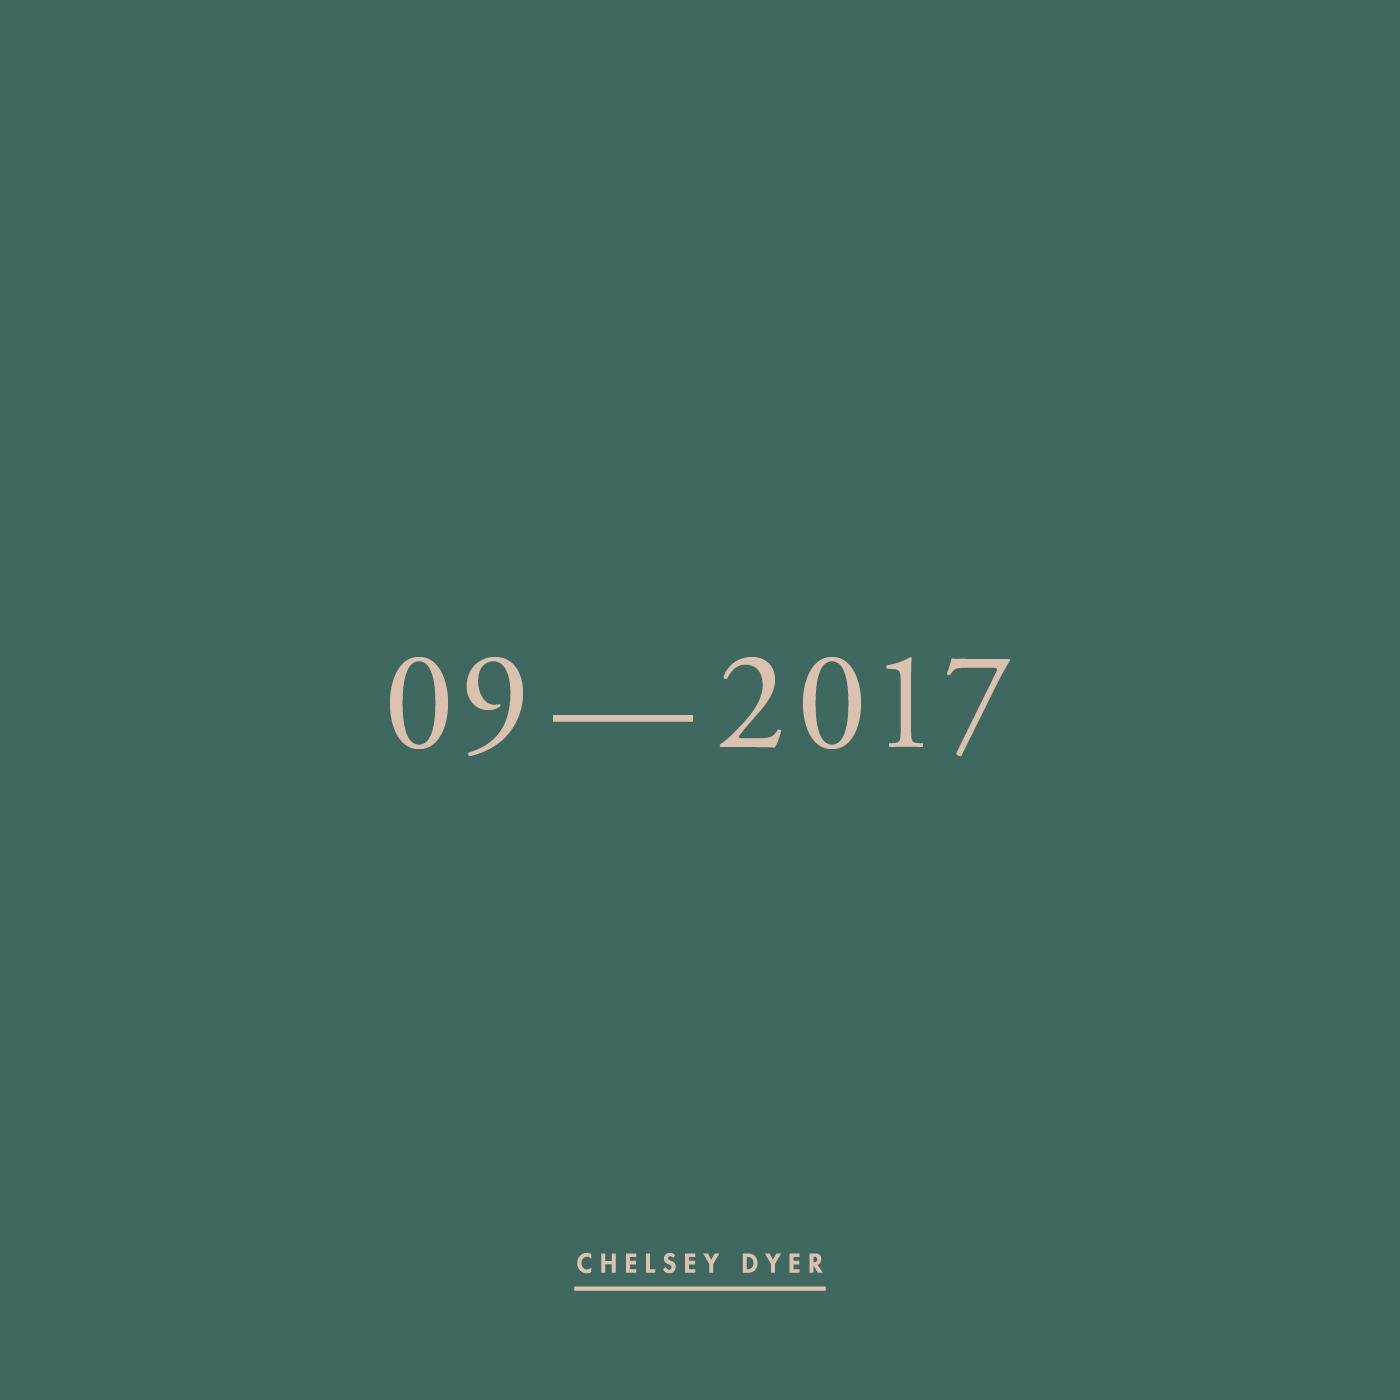 Chelsey Dyer / 09—2017 Mixtape